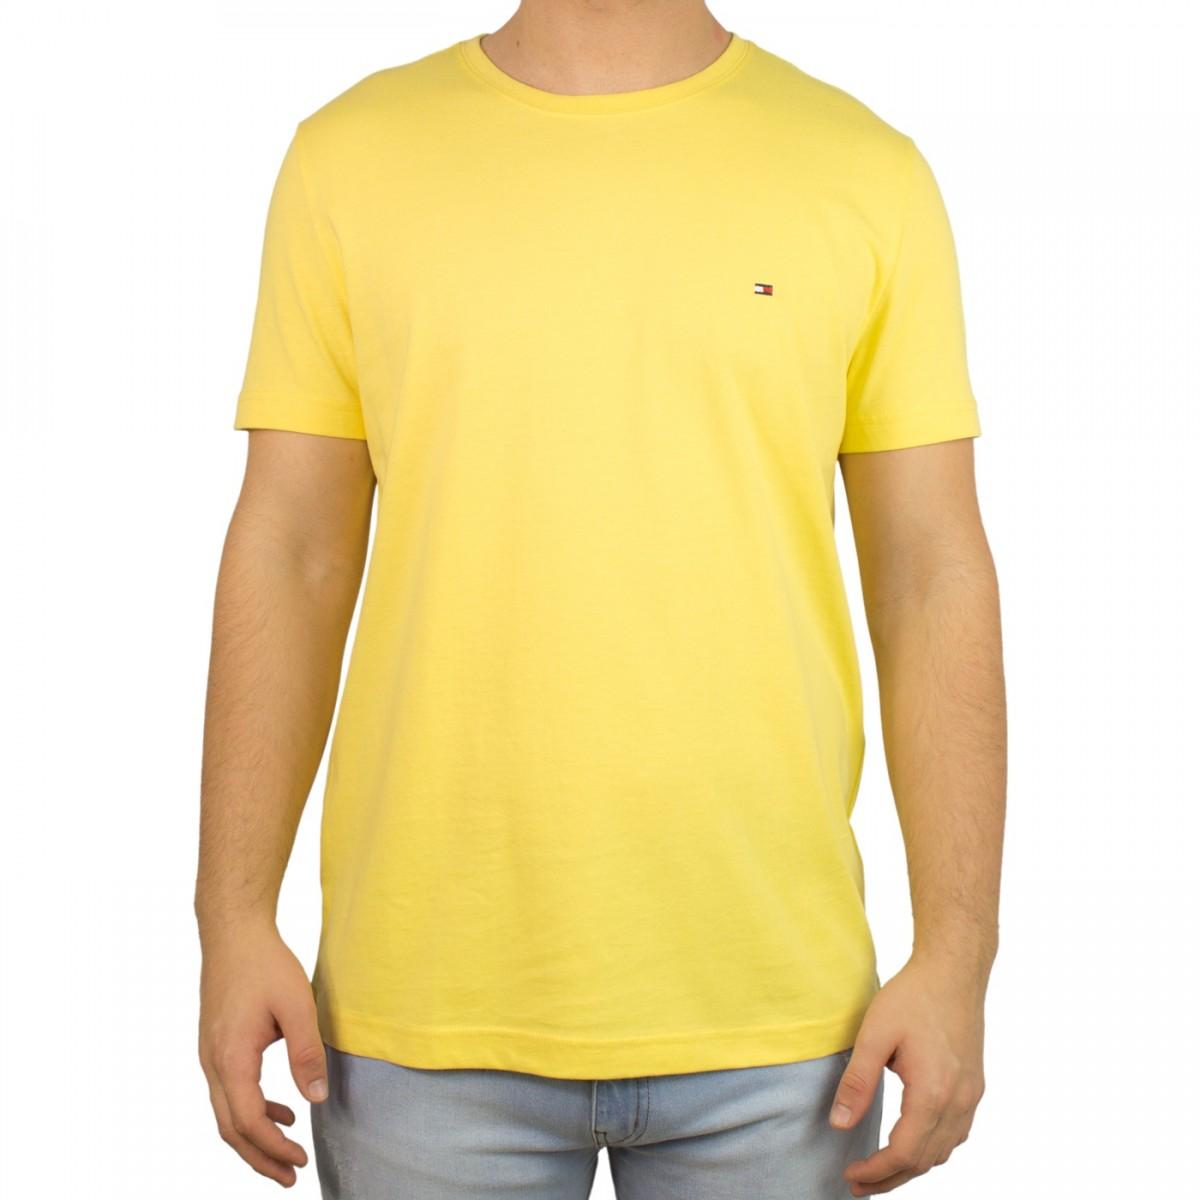 09ee5e49d Bizz Store - Camiseta Masculina Tommy Hilfiger Gola Redonda